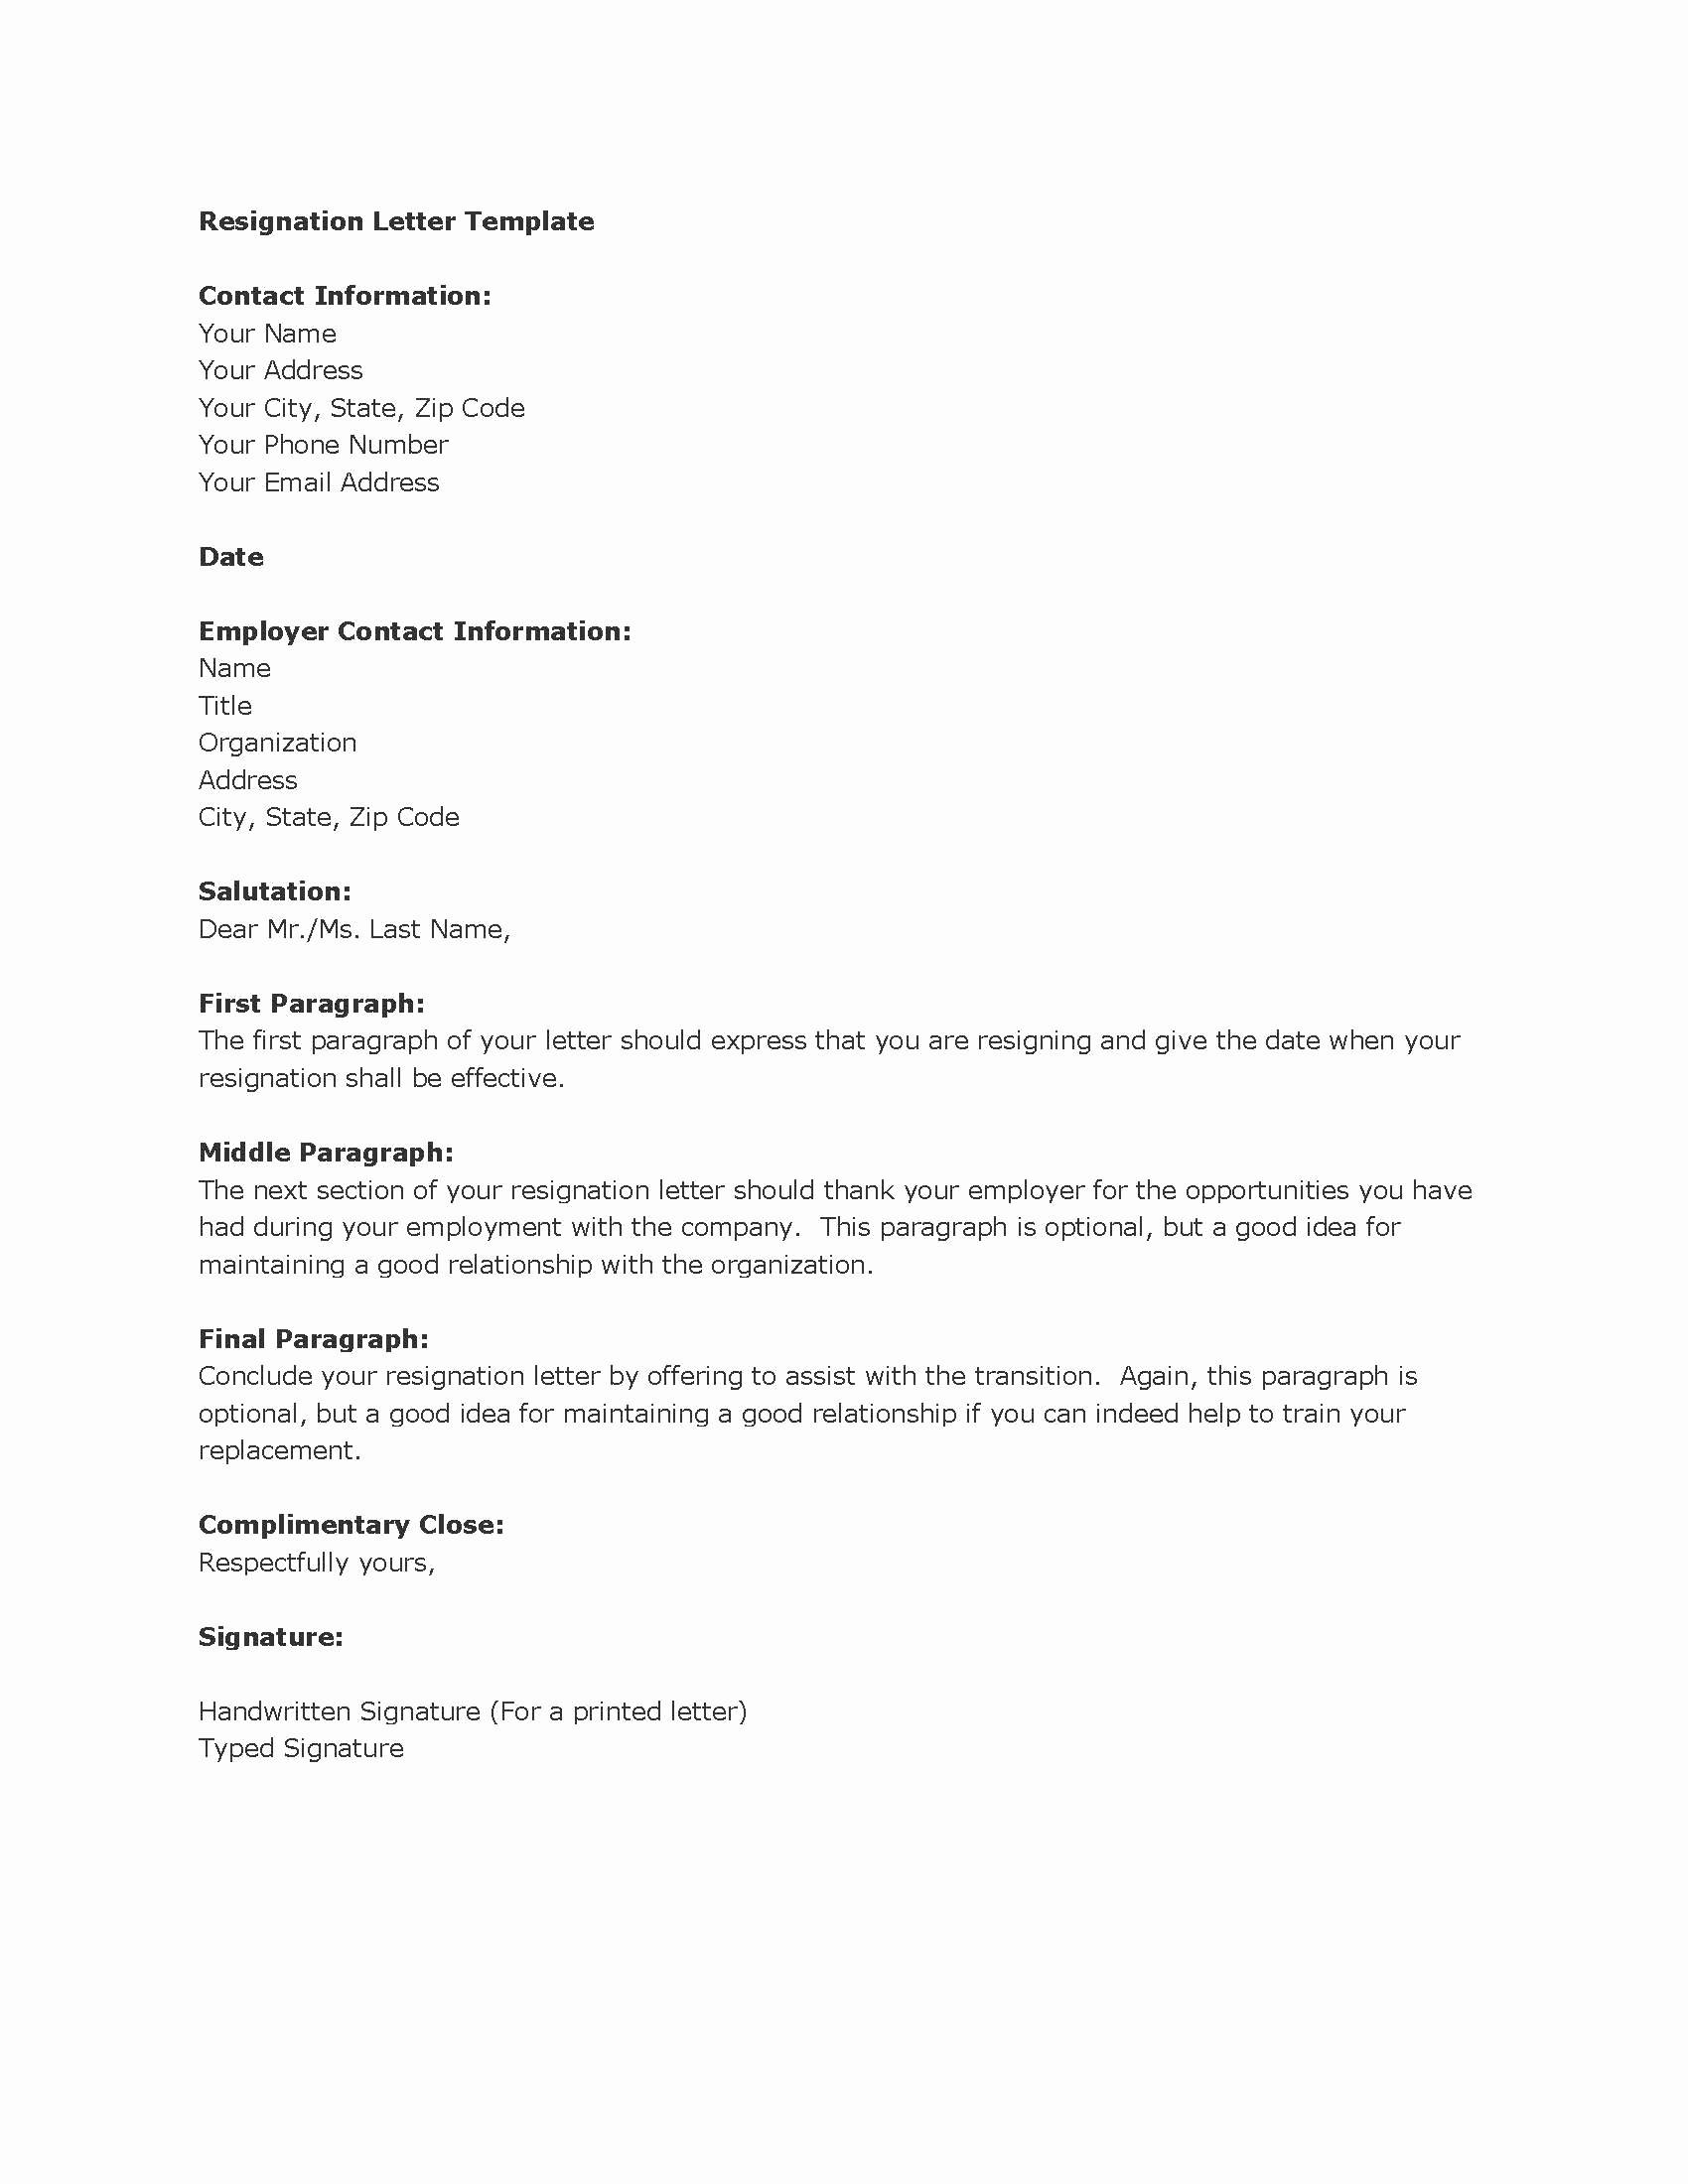 Letter Of Resignation Template Microsoft Inspirational Best Letter Of Resignation Template